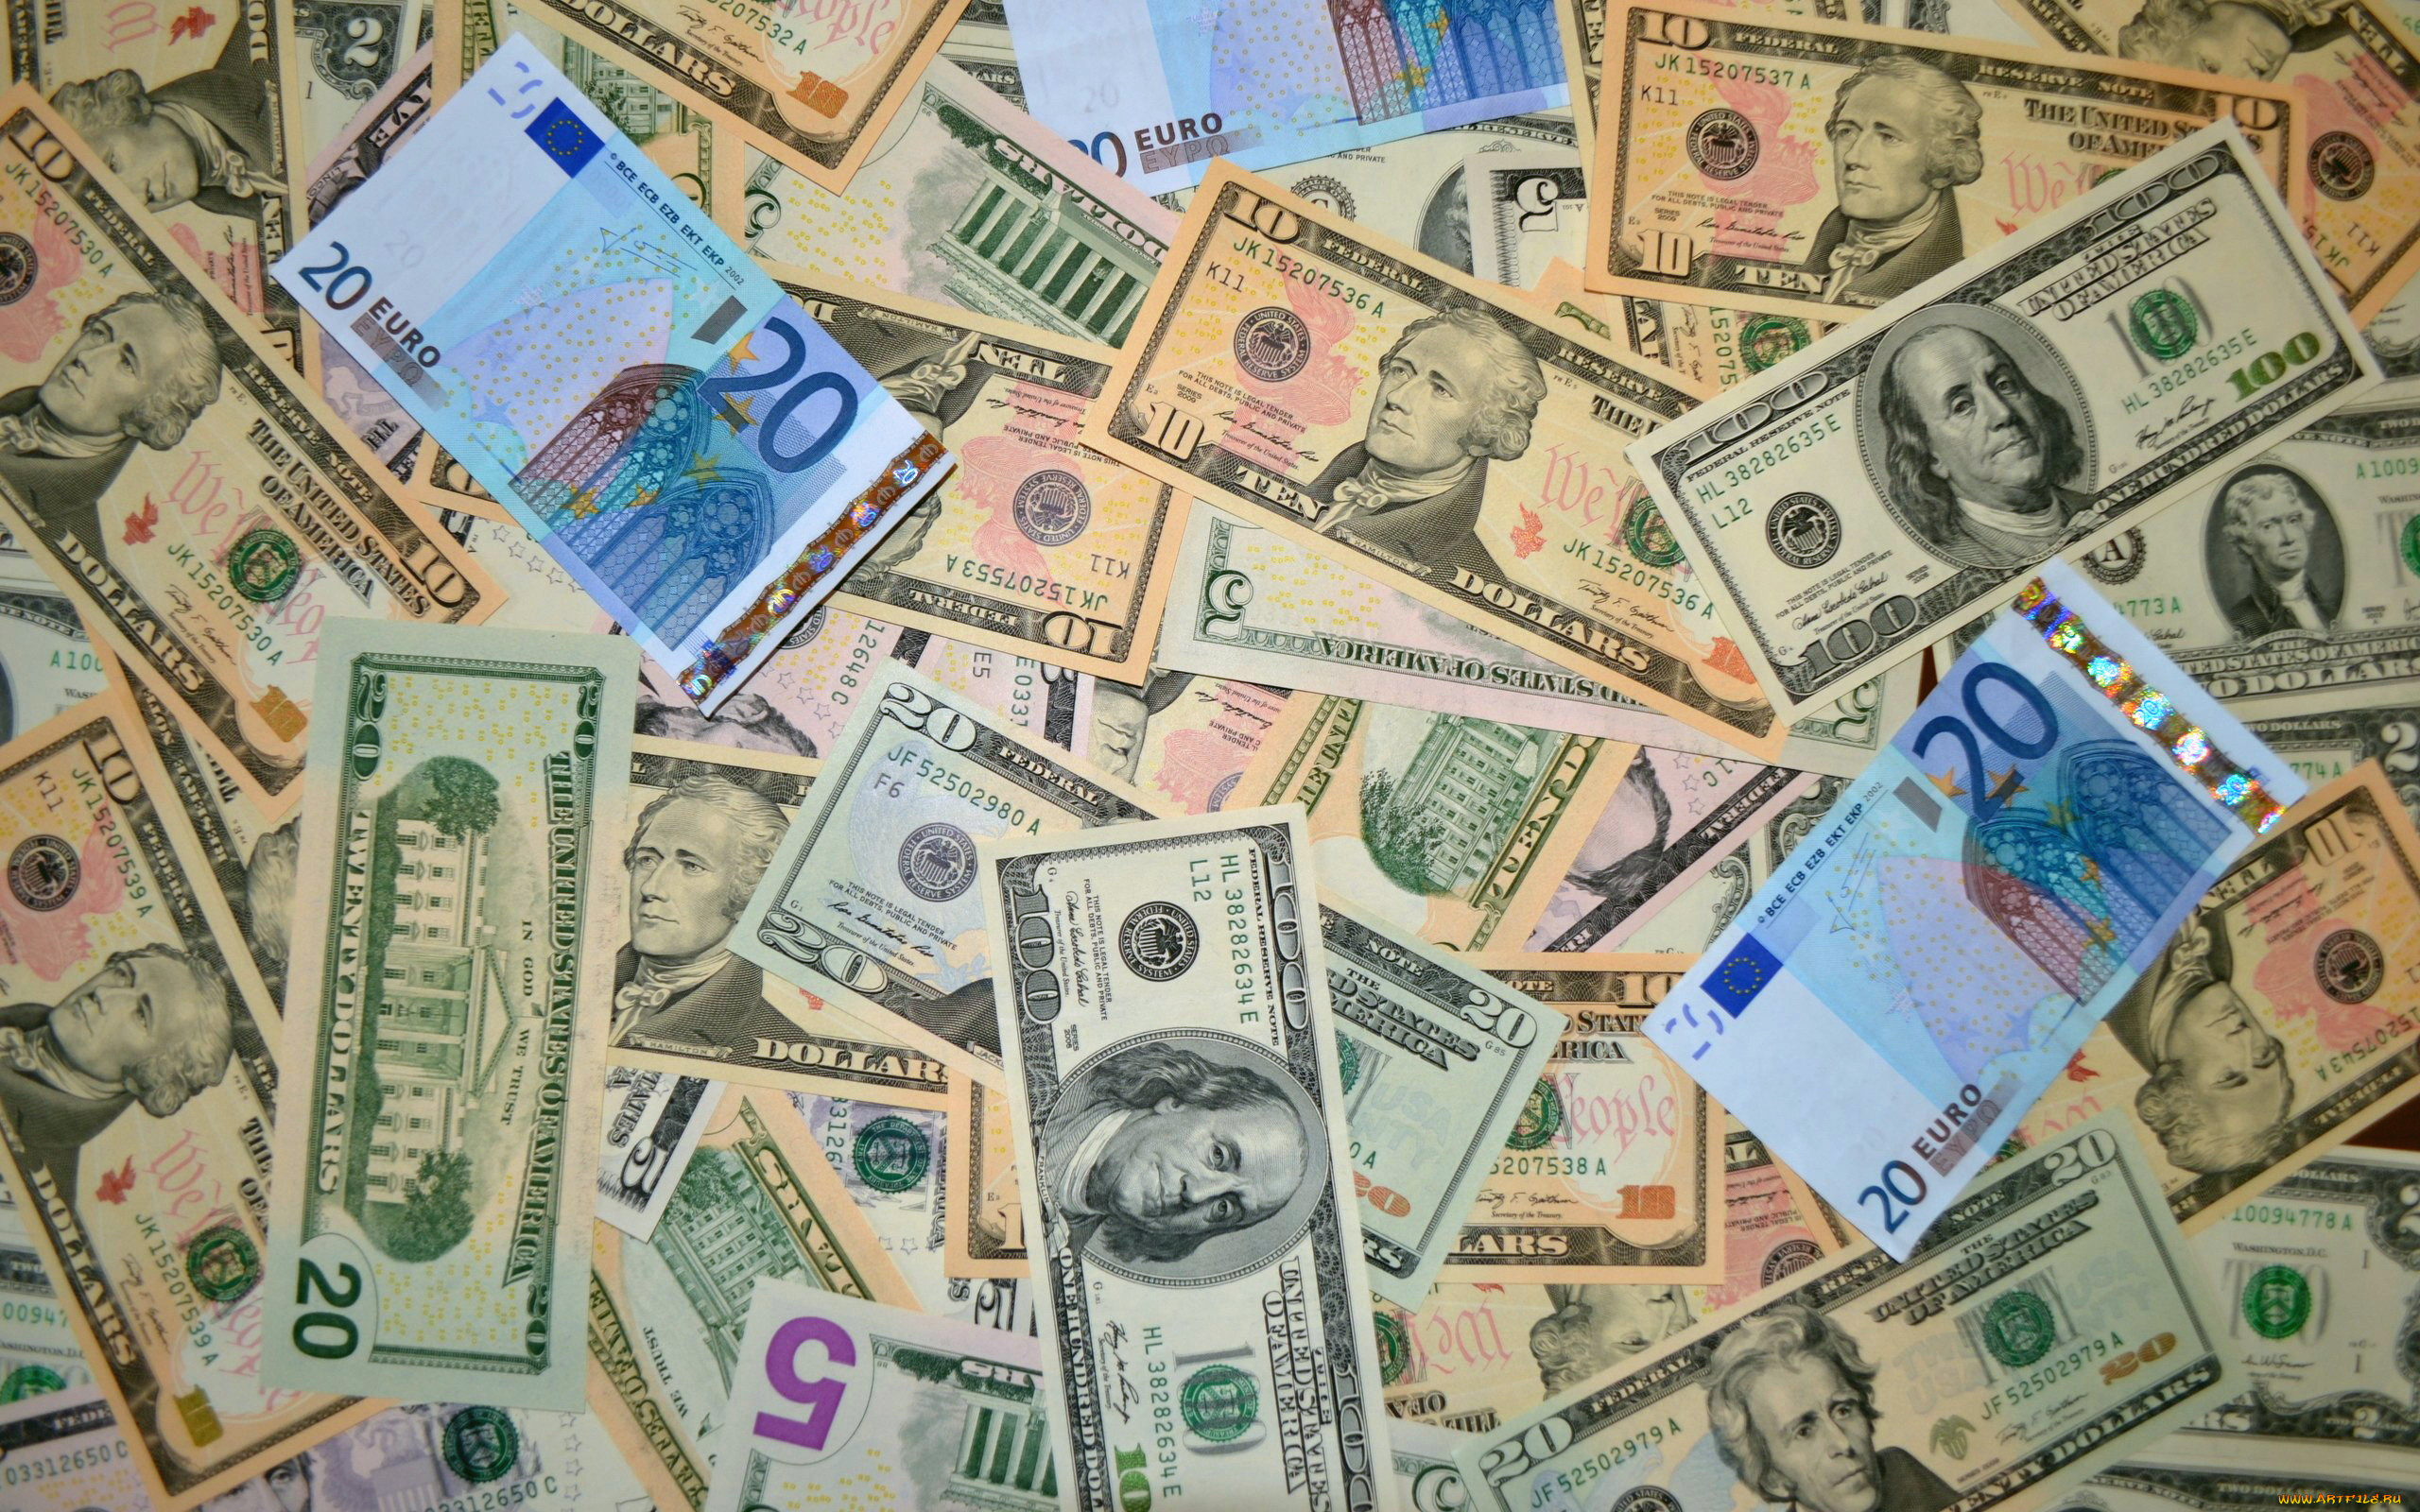 Картинки с денежными знаками доллар и евро